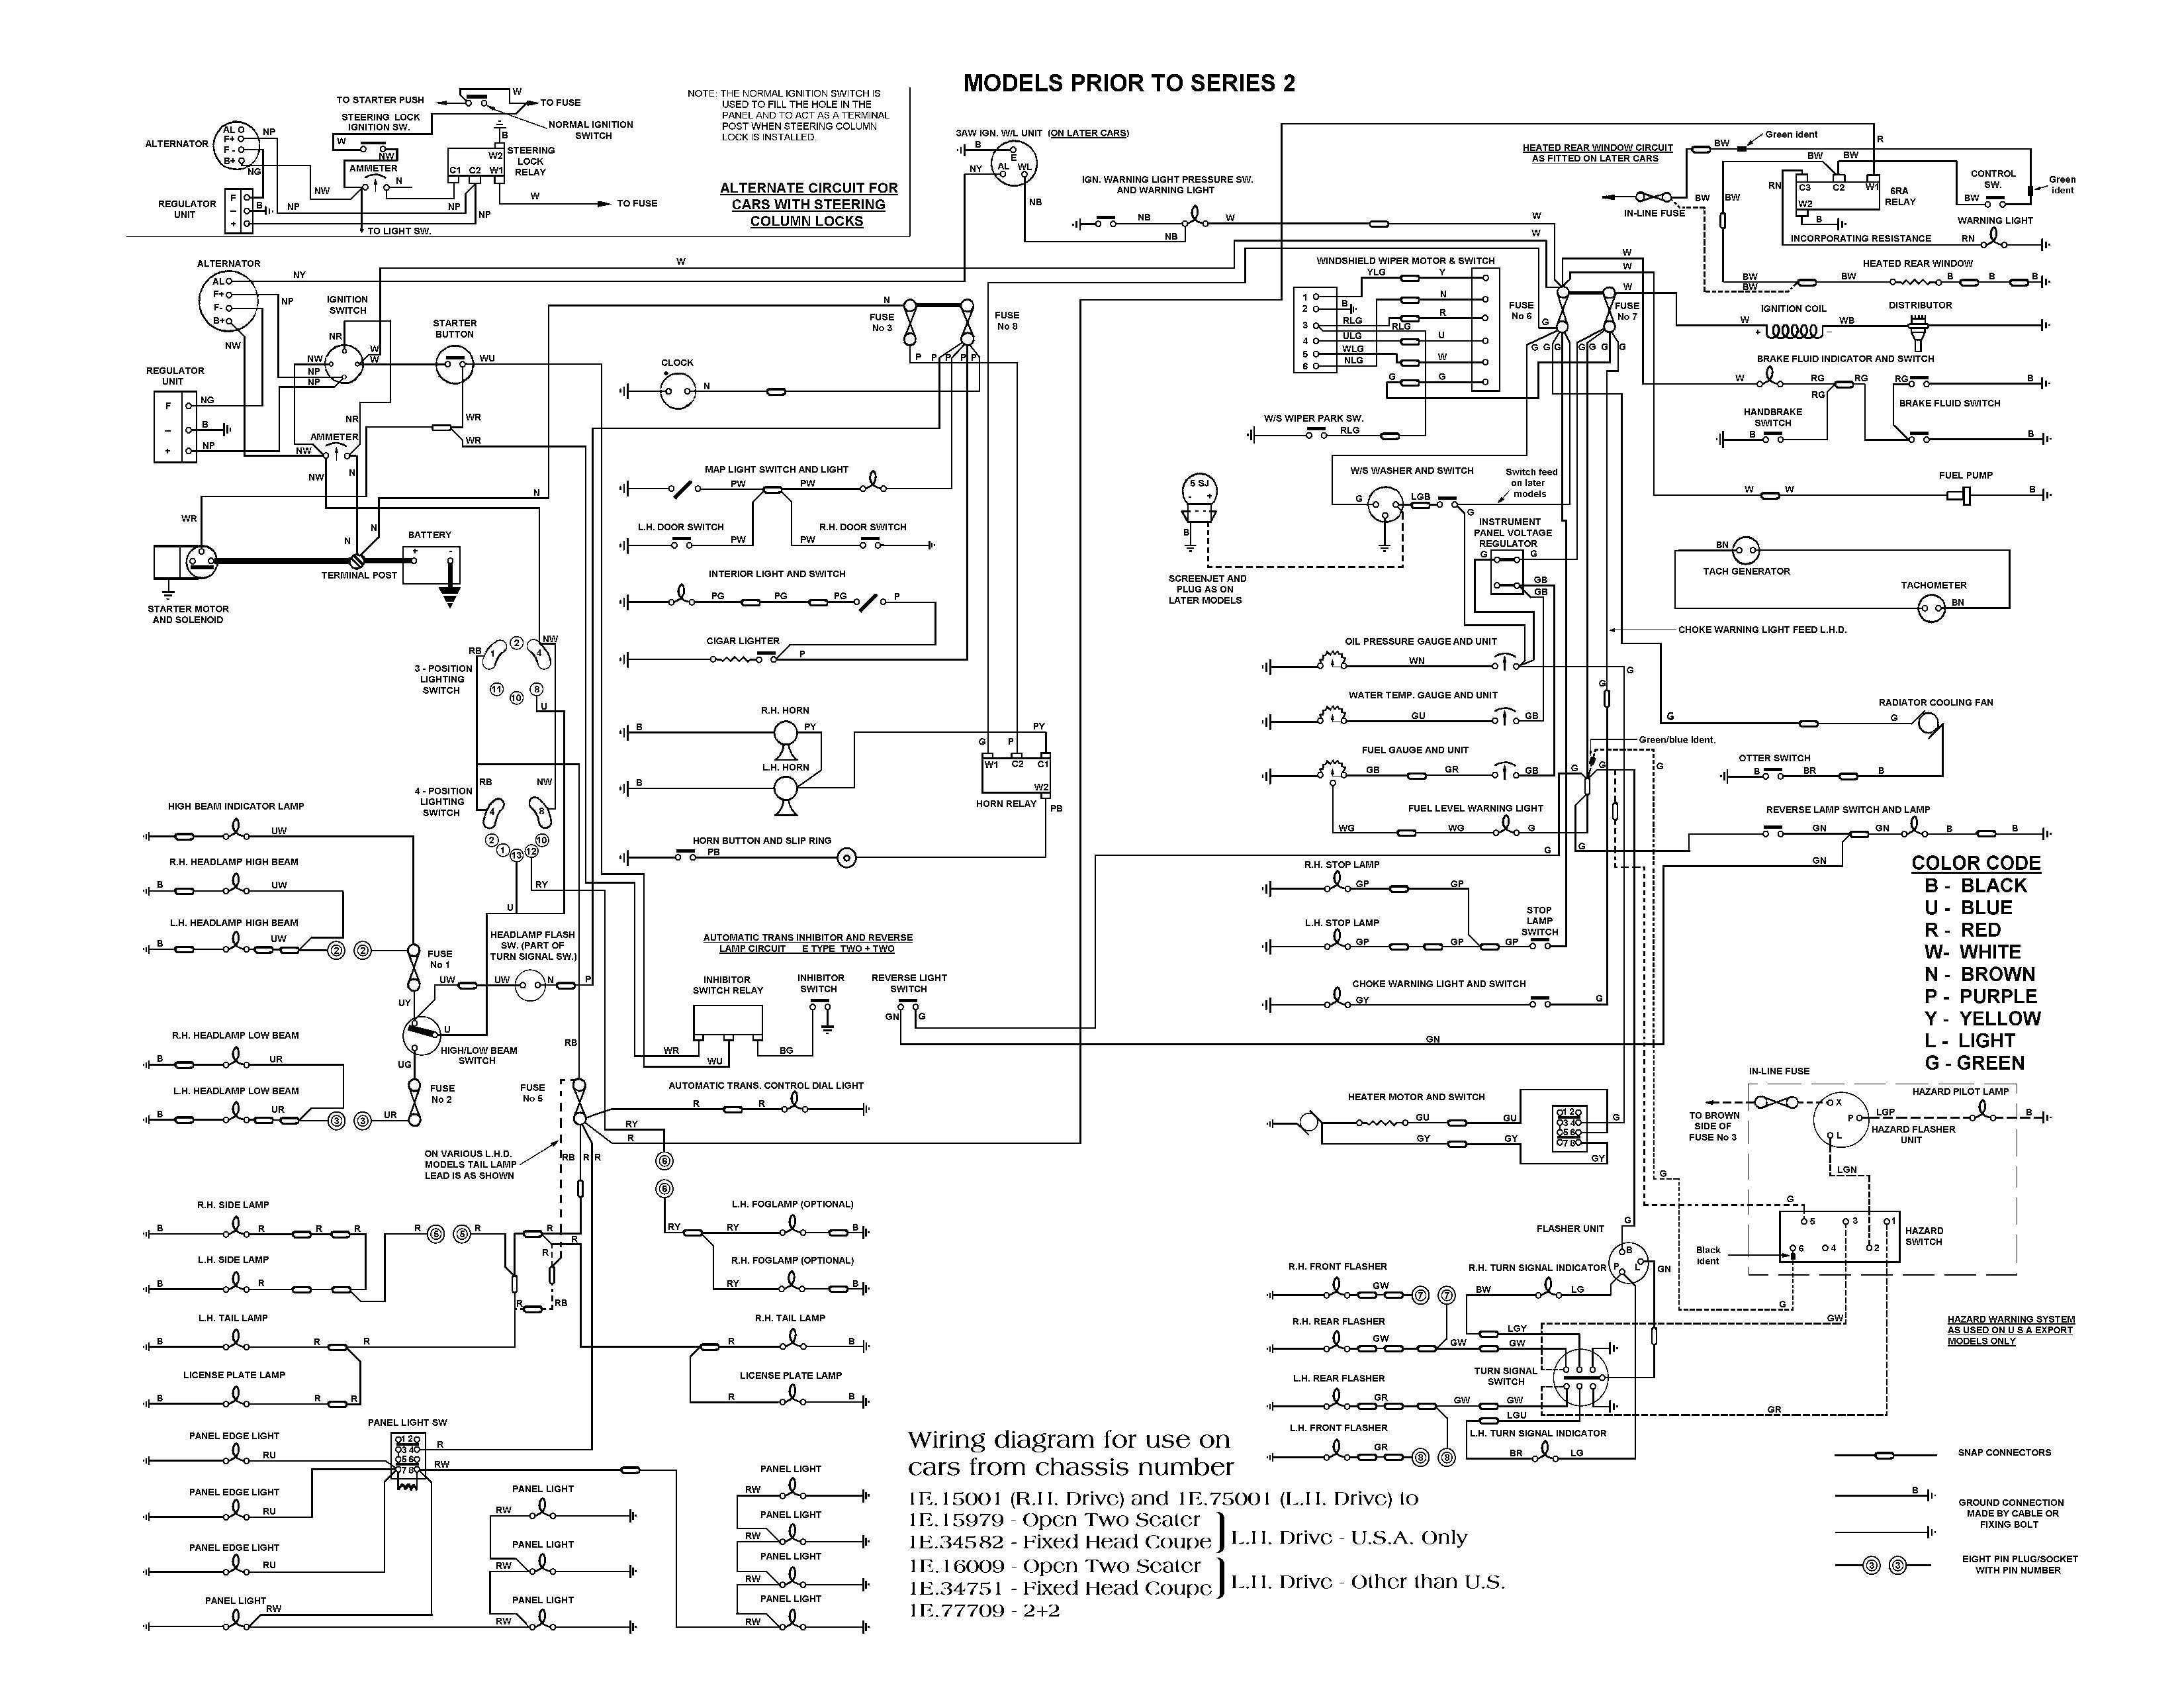 wiring diagram open source bathroom software gallery sample download best ponent wire symbols